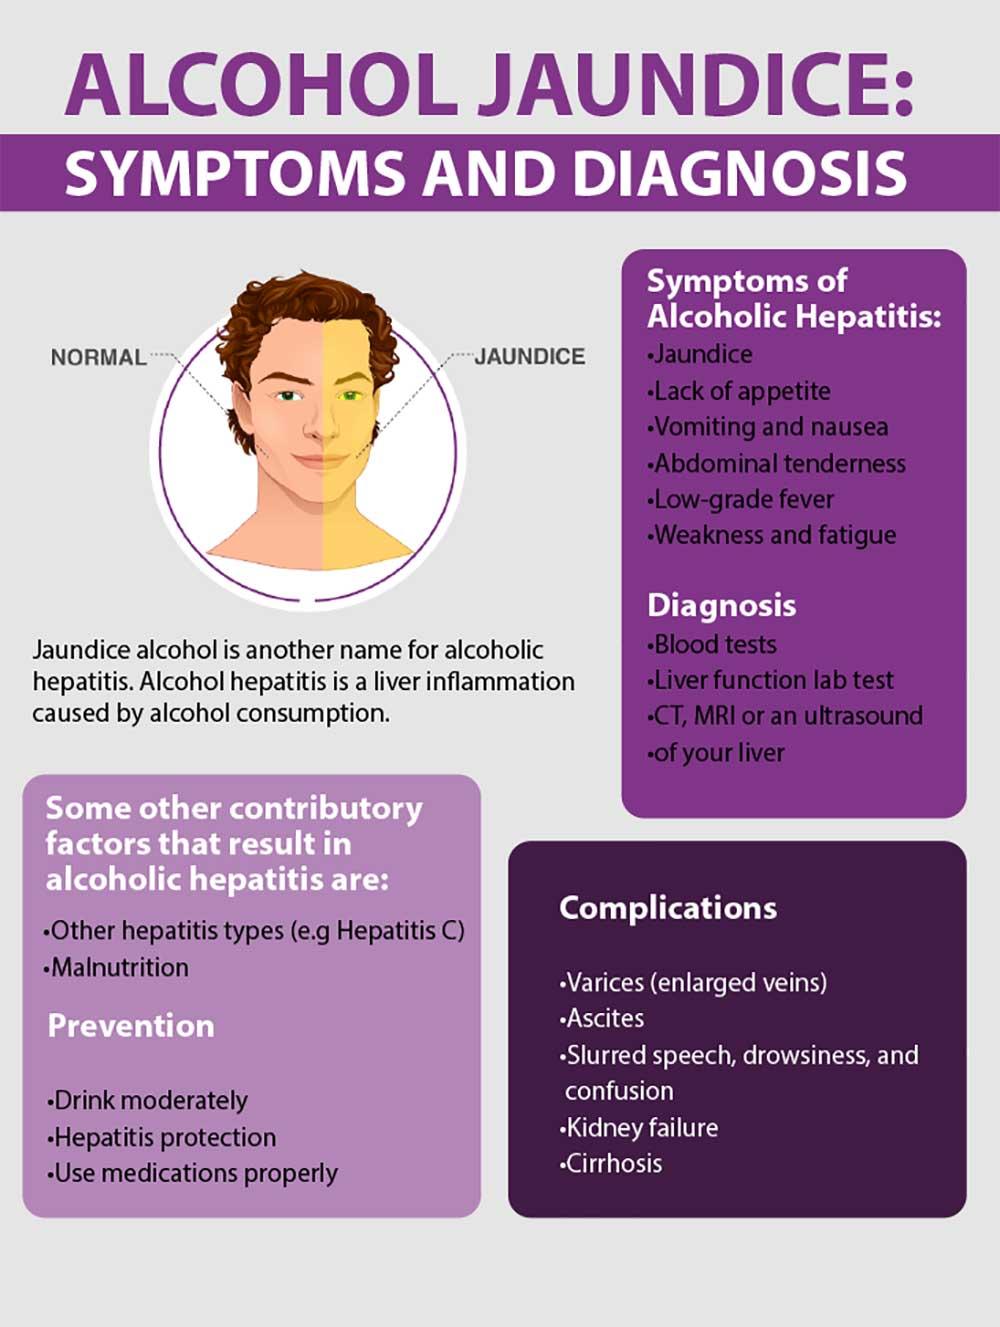 Symptoms and diagnosis of Alcohol jaundice